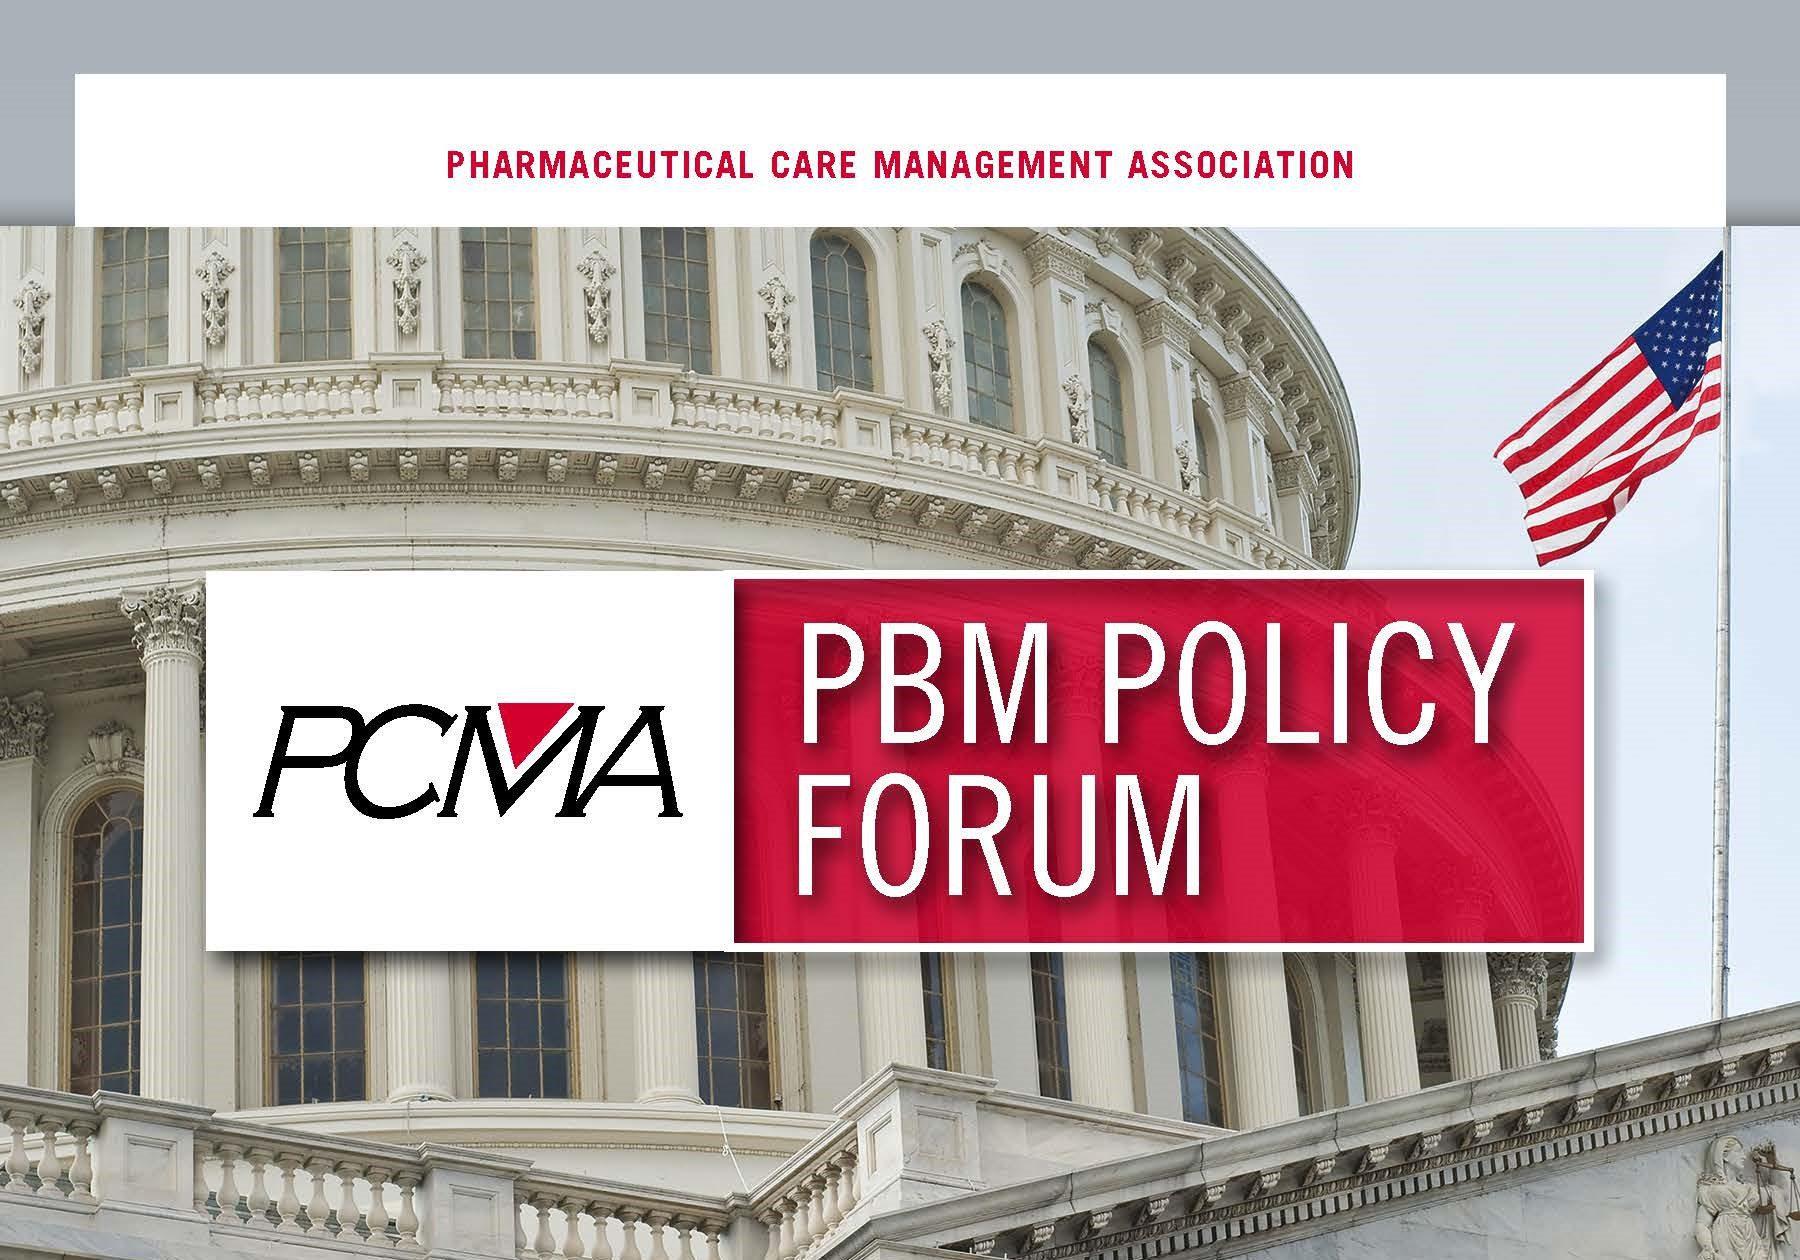 2015_PCMA PBM Policy Forum_Program Book